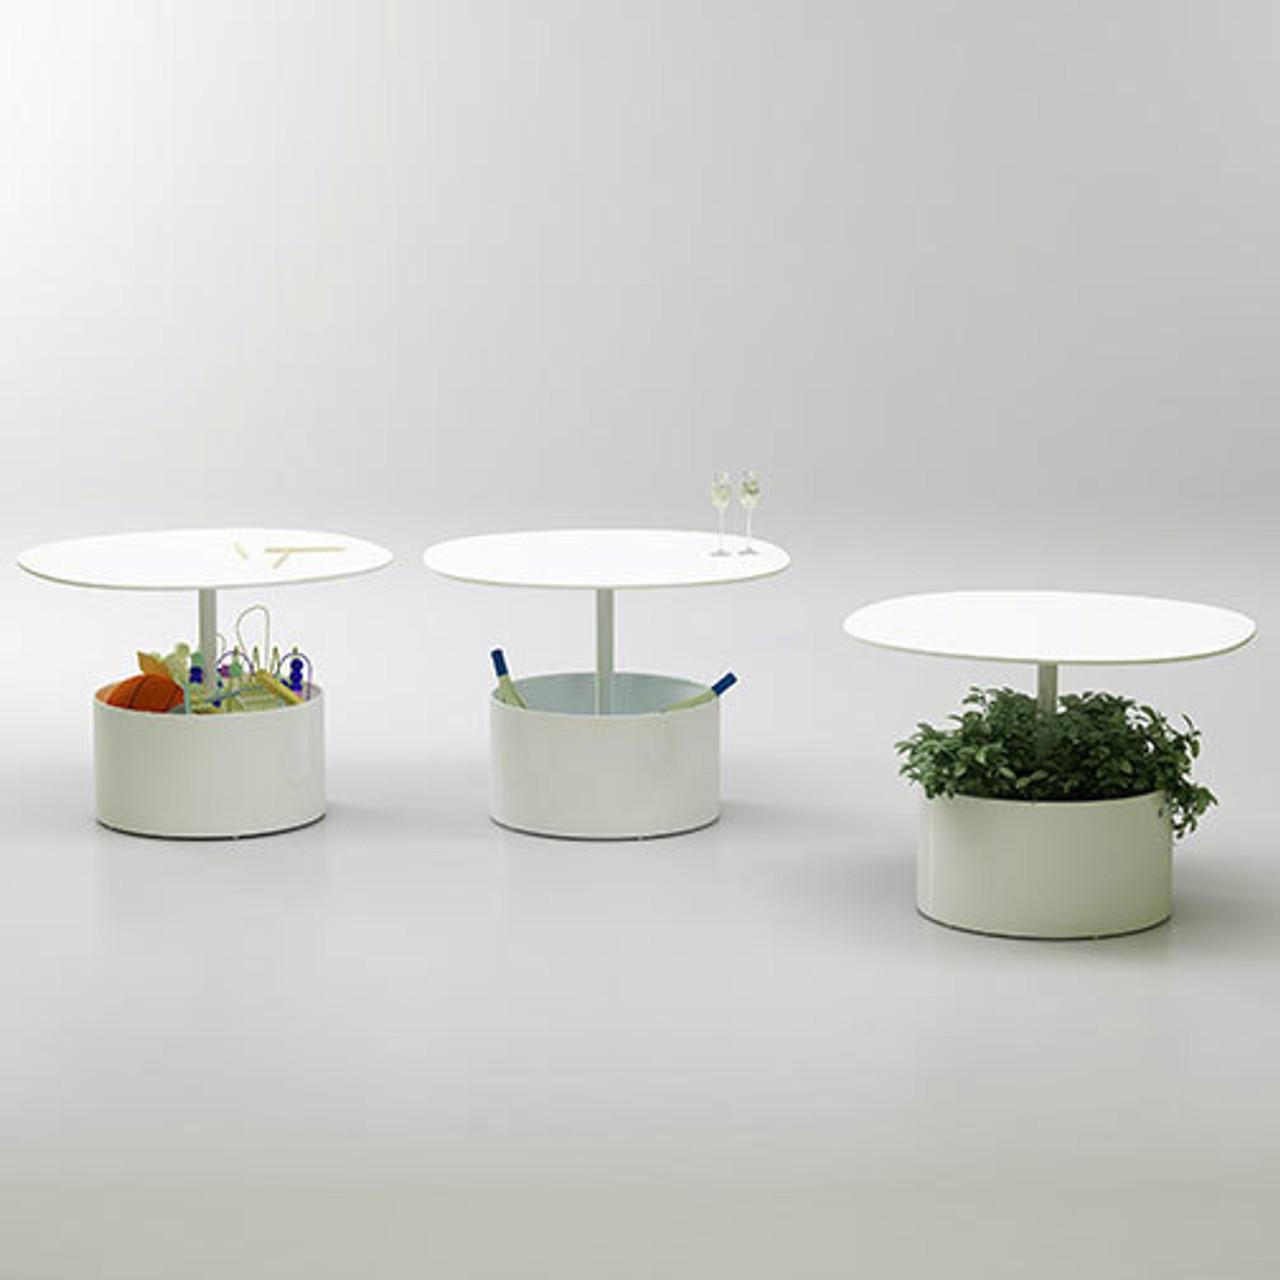 Magnuson Laura Accent Table - Planter